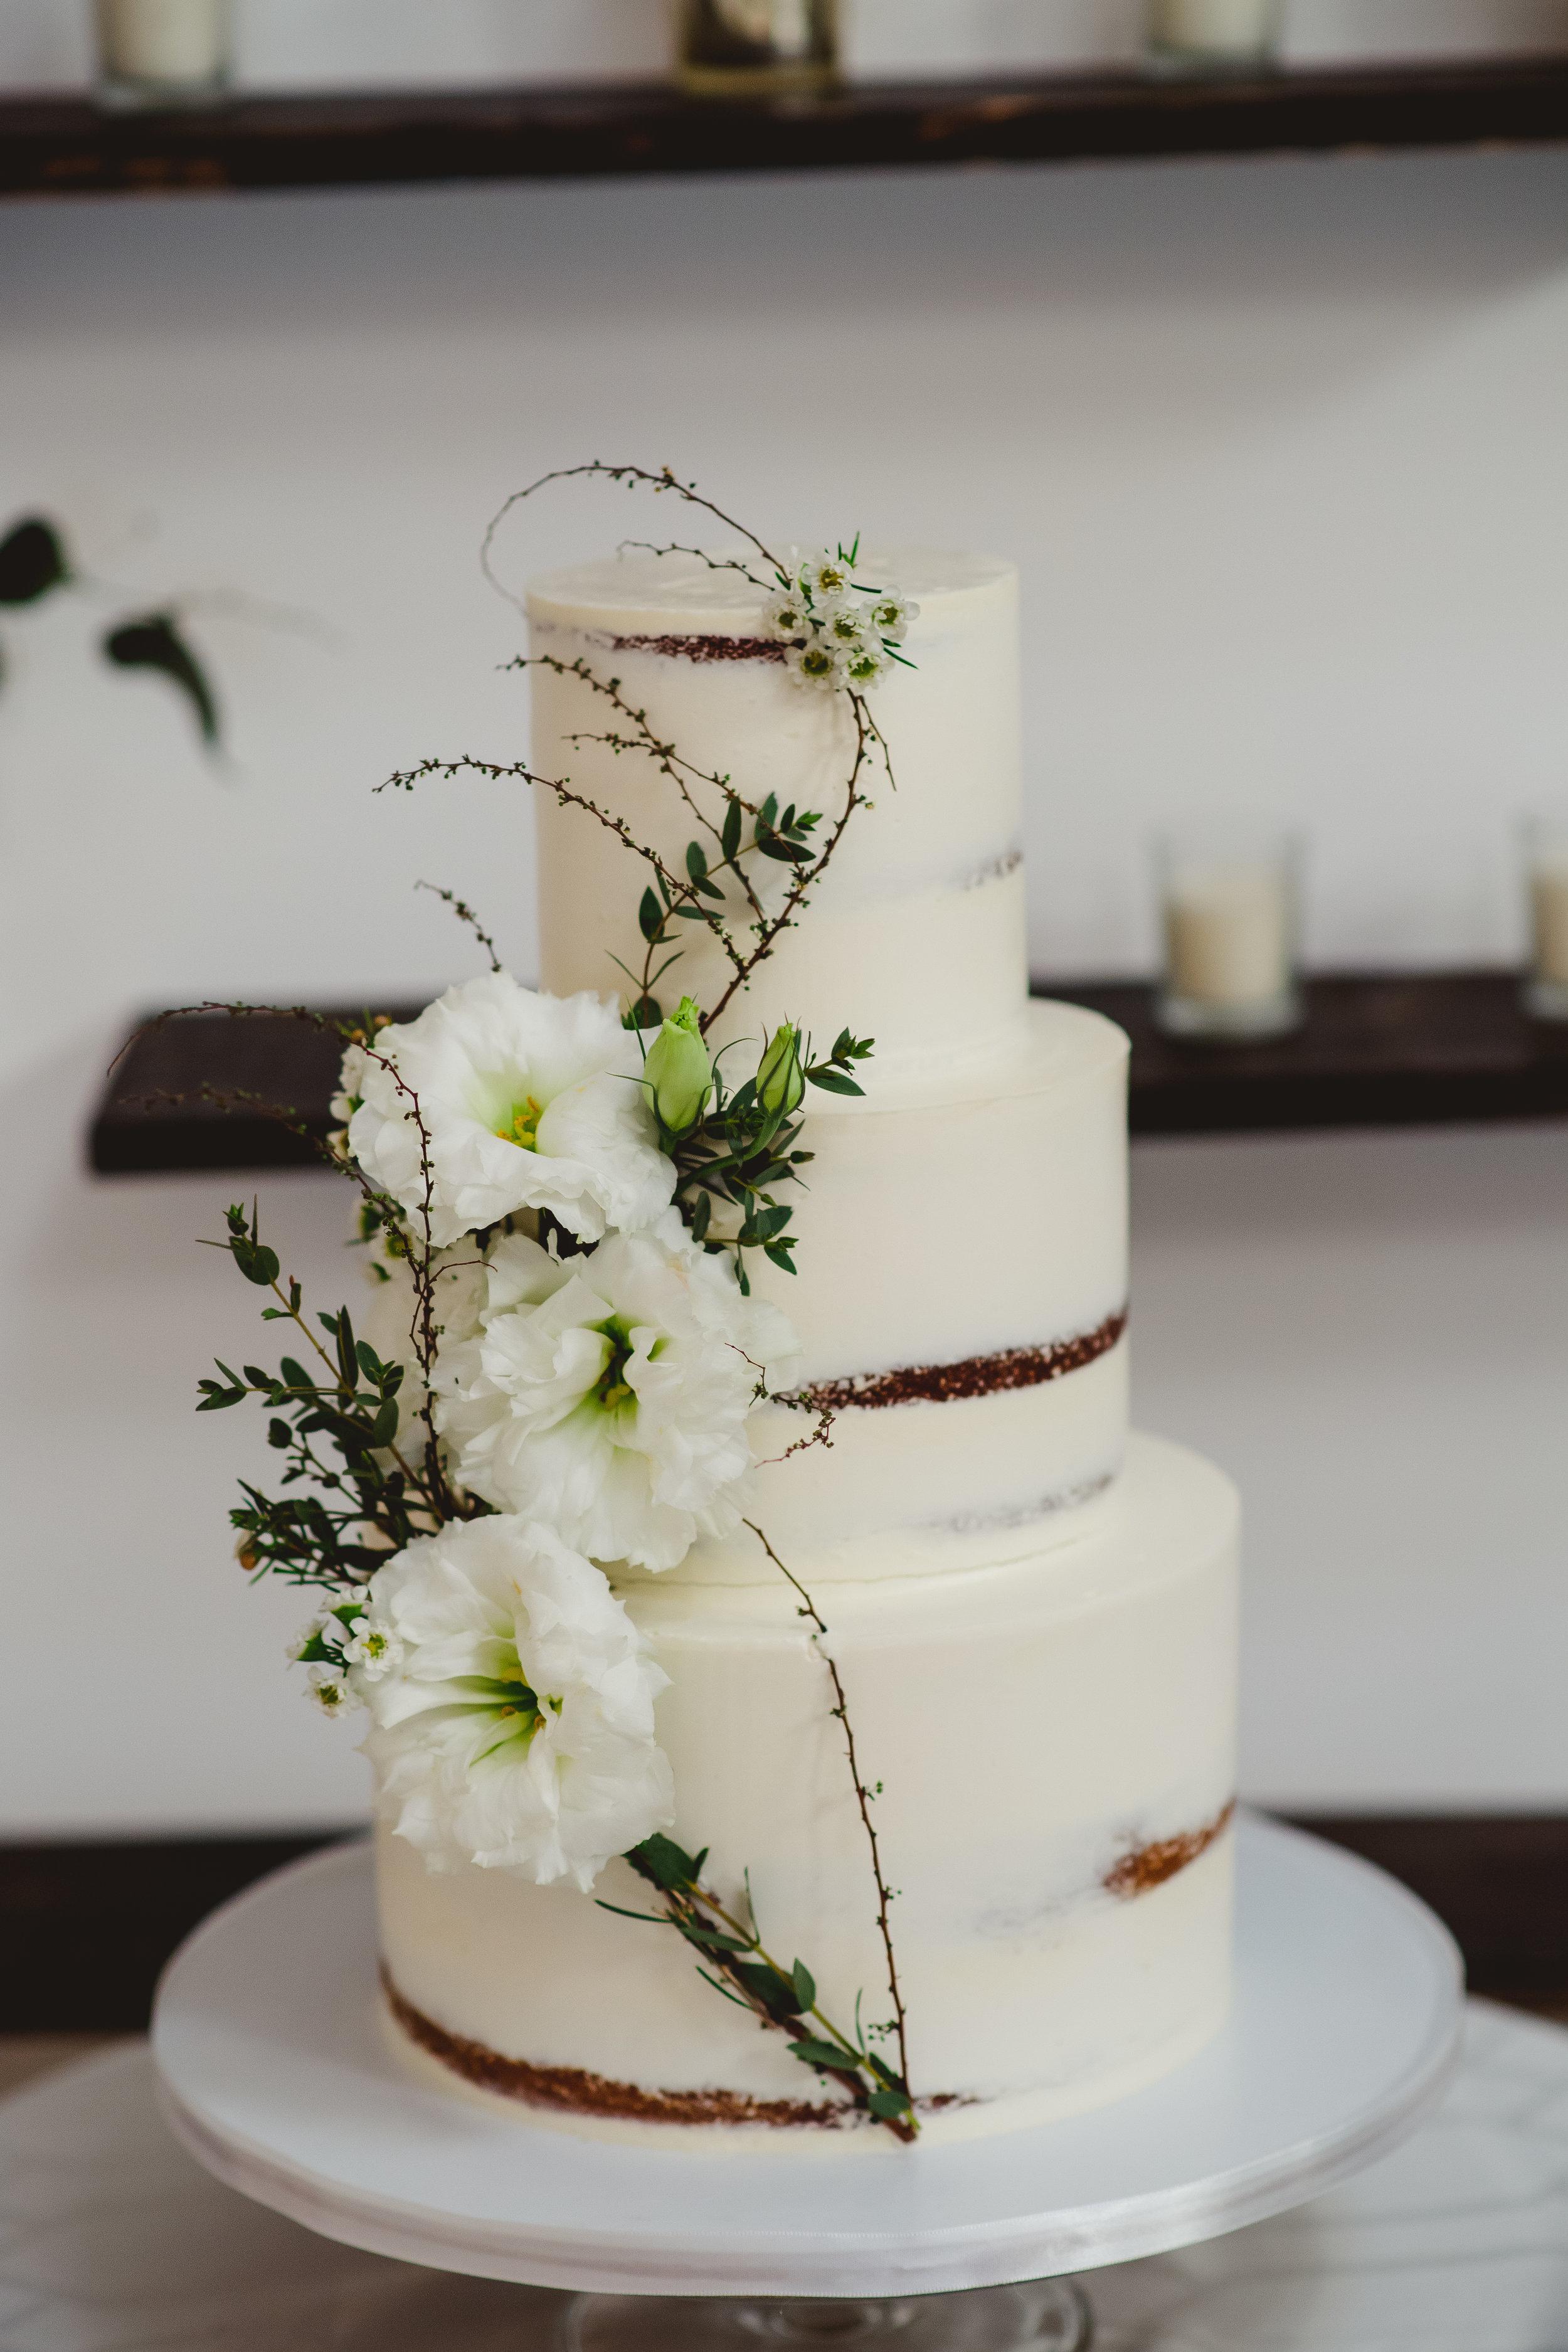 earth-and-sugar-cake